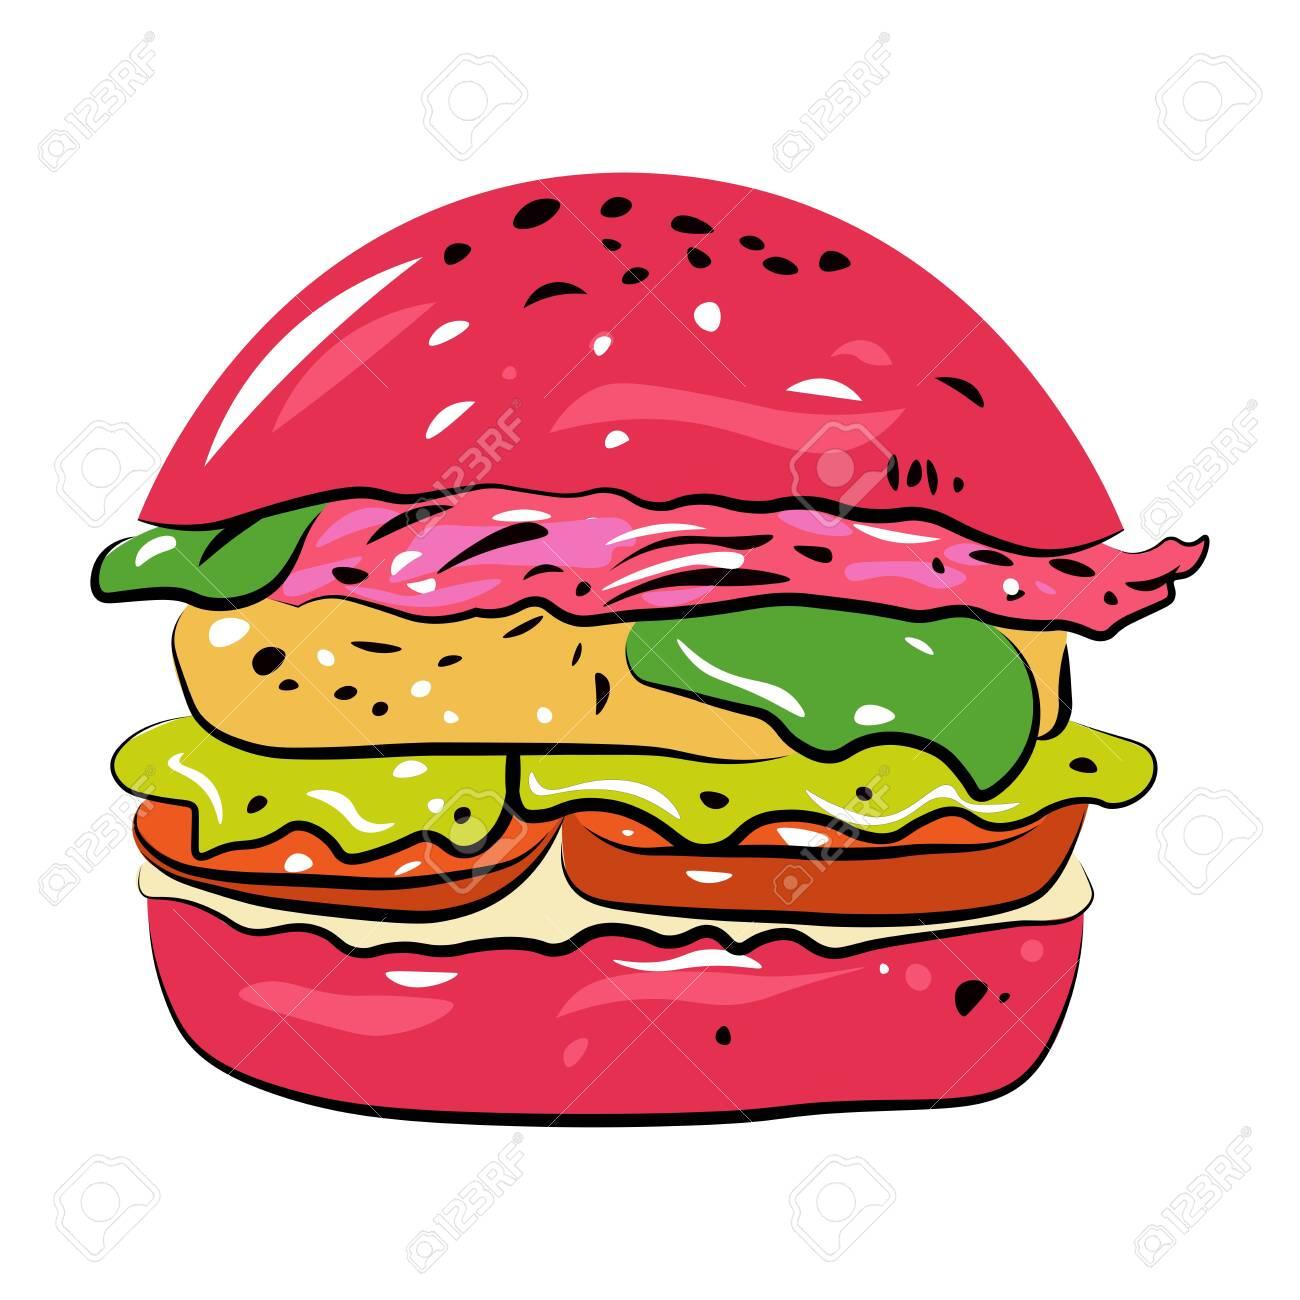 Hamburger on a white background. - 143507286